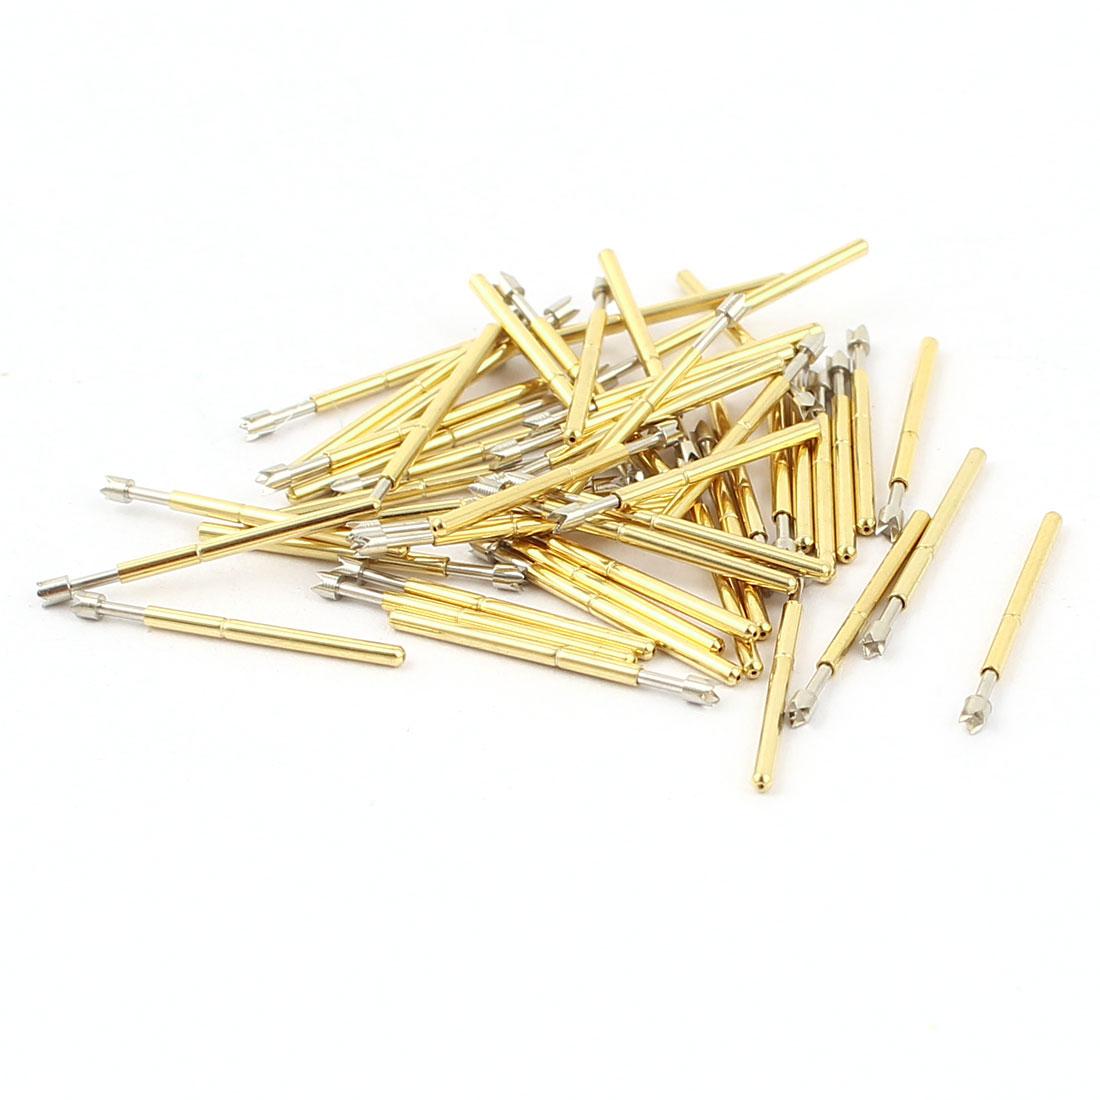 50 Pcs P75-Q2 1.3mm 4-Point Crown Tip Spring Testing Probes Pin